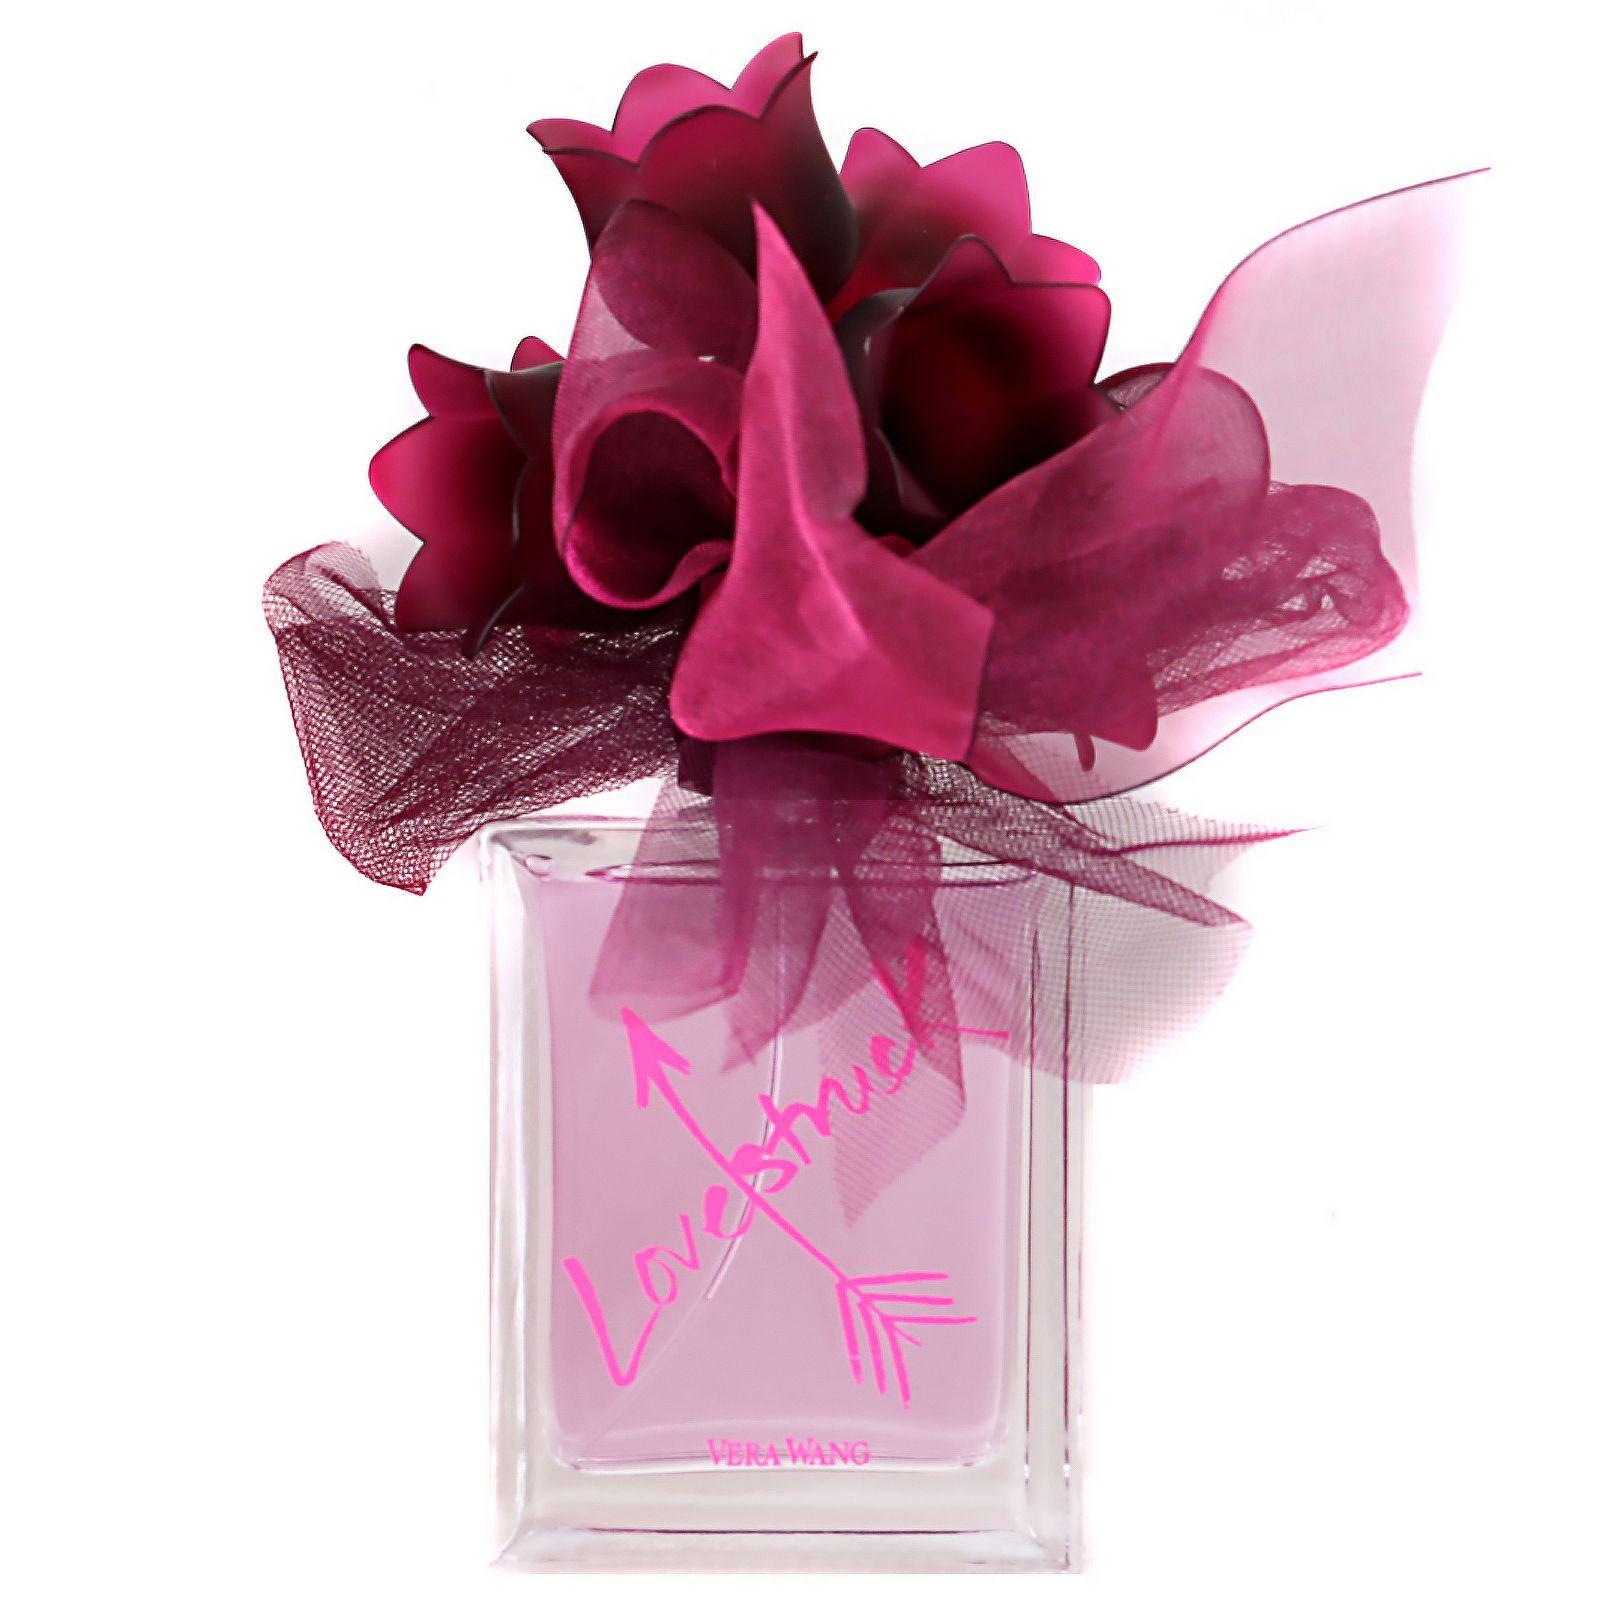 Vera Wang Love Struck Eau de Parfum Spray 100ml Lavender